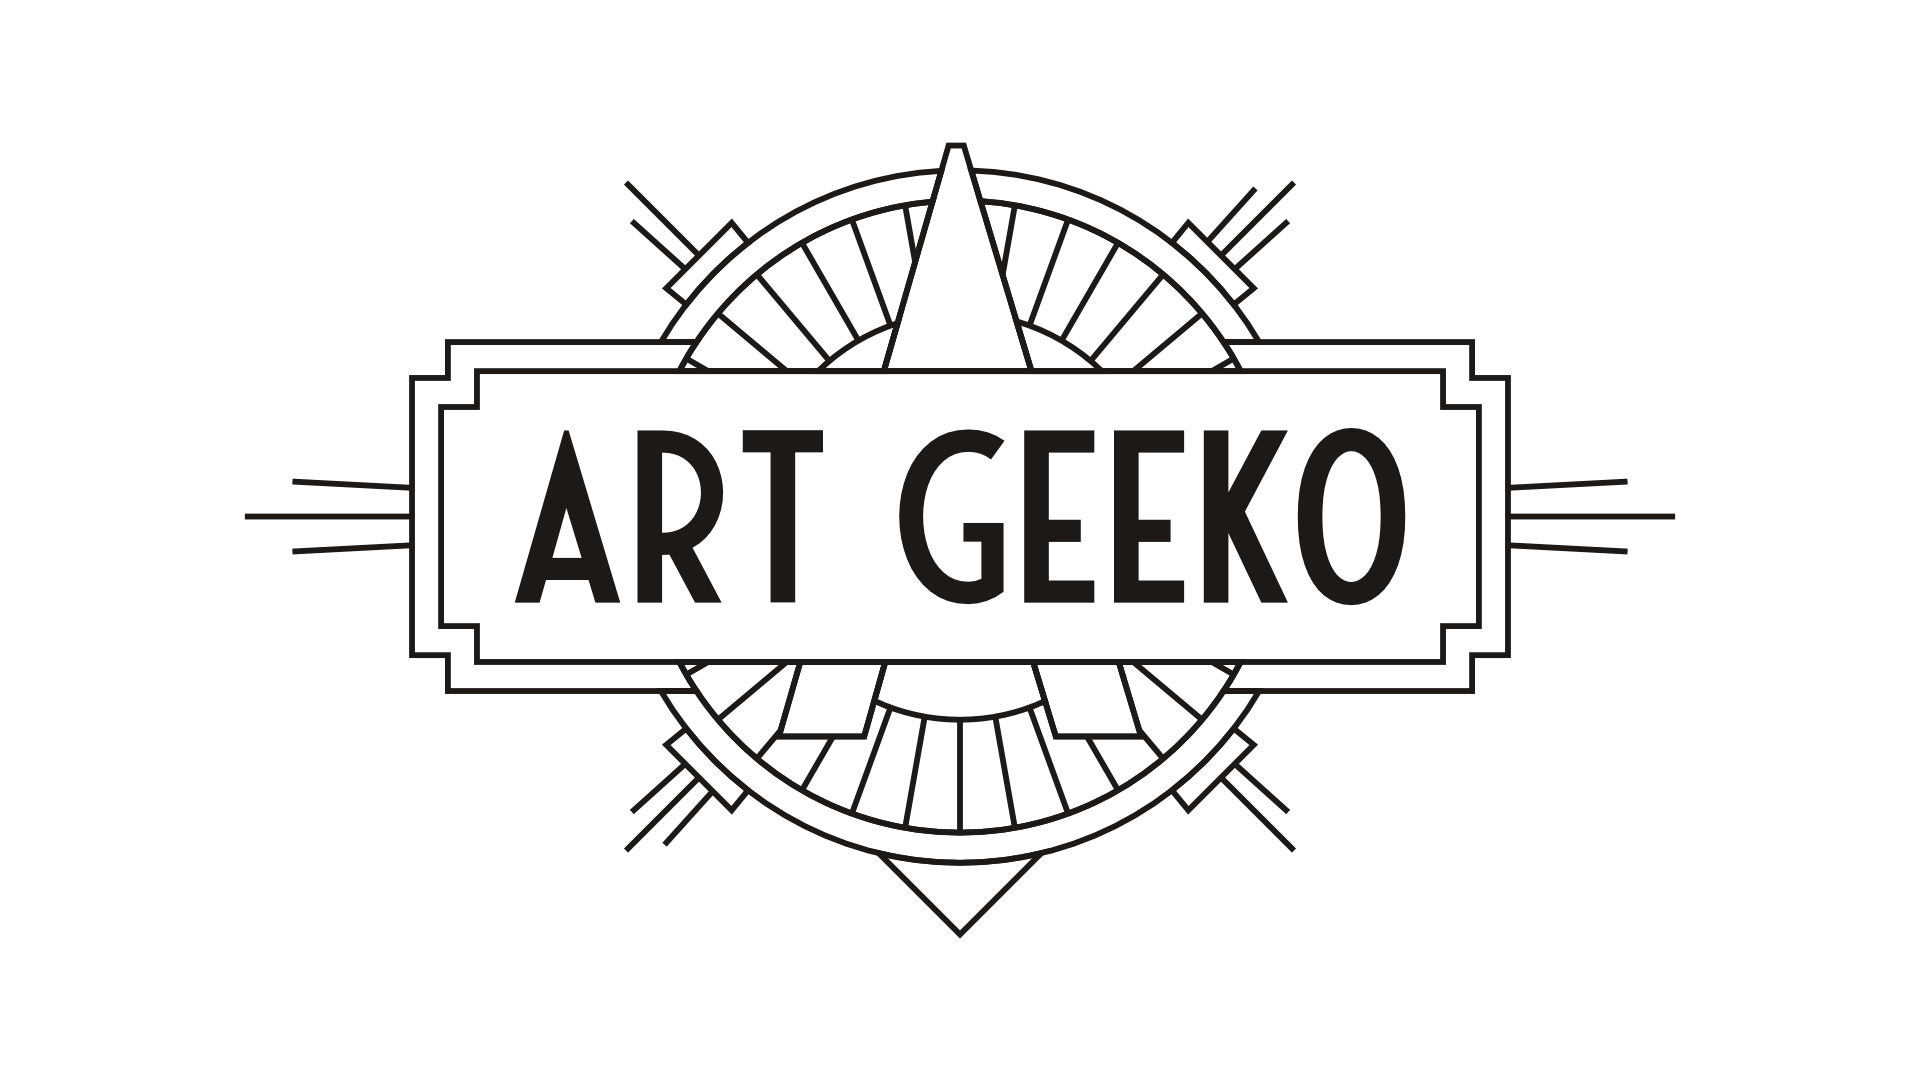 Art Geeko